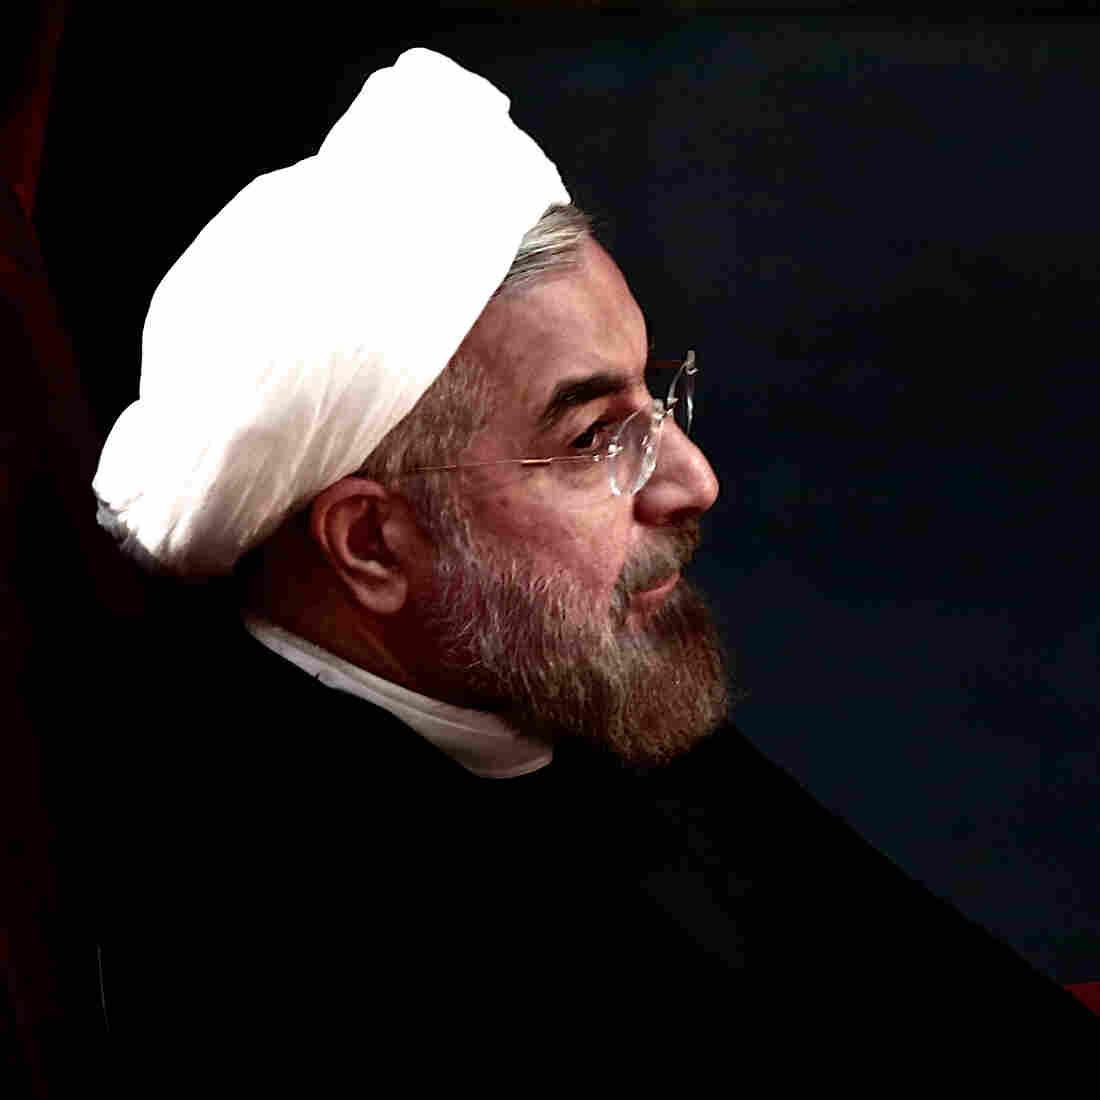 Iran's New Leader Calls For 'Constructive Dialogue'